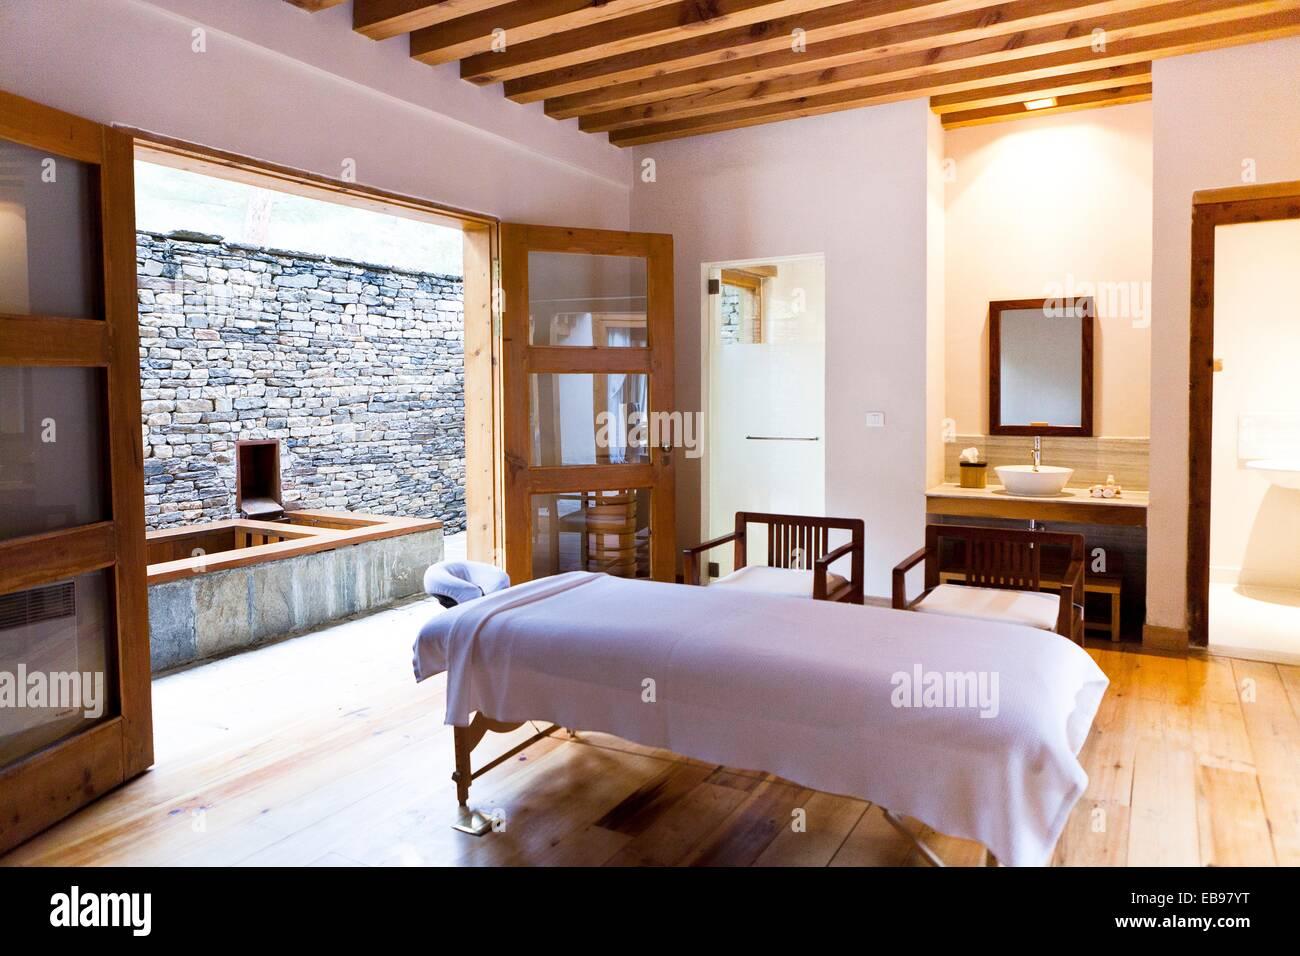 Treatment room of como villa boutique luxury resort uma for Boutique luxury